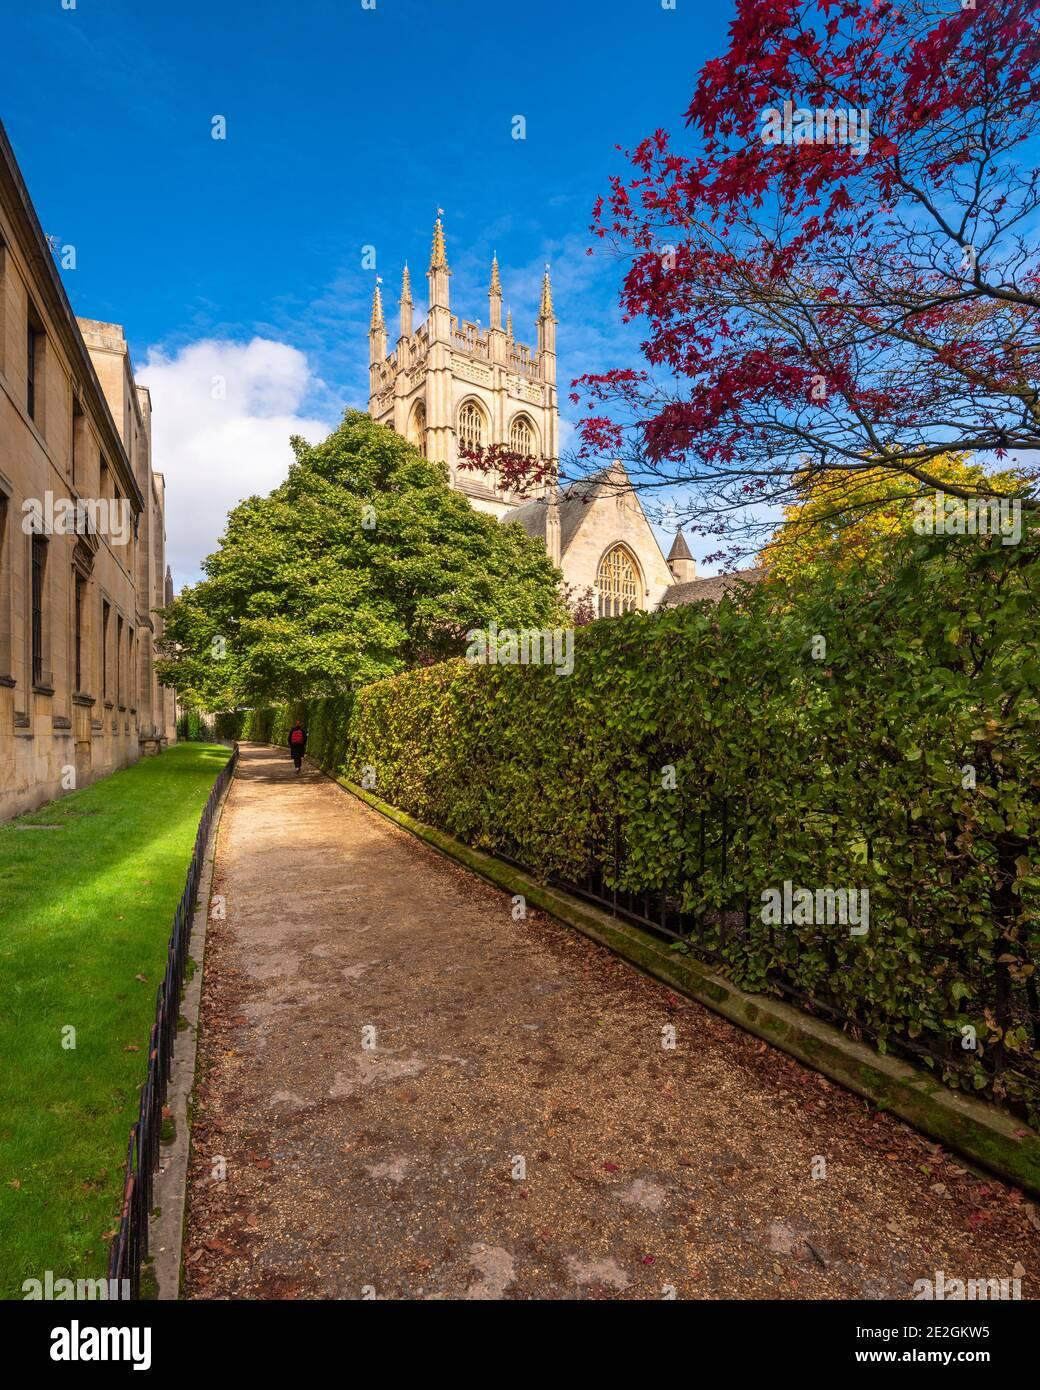 Merton College, Oxford; parte de la Universidad de Oxford, Inglaterra. Foto de stock